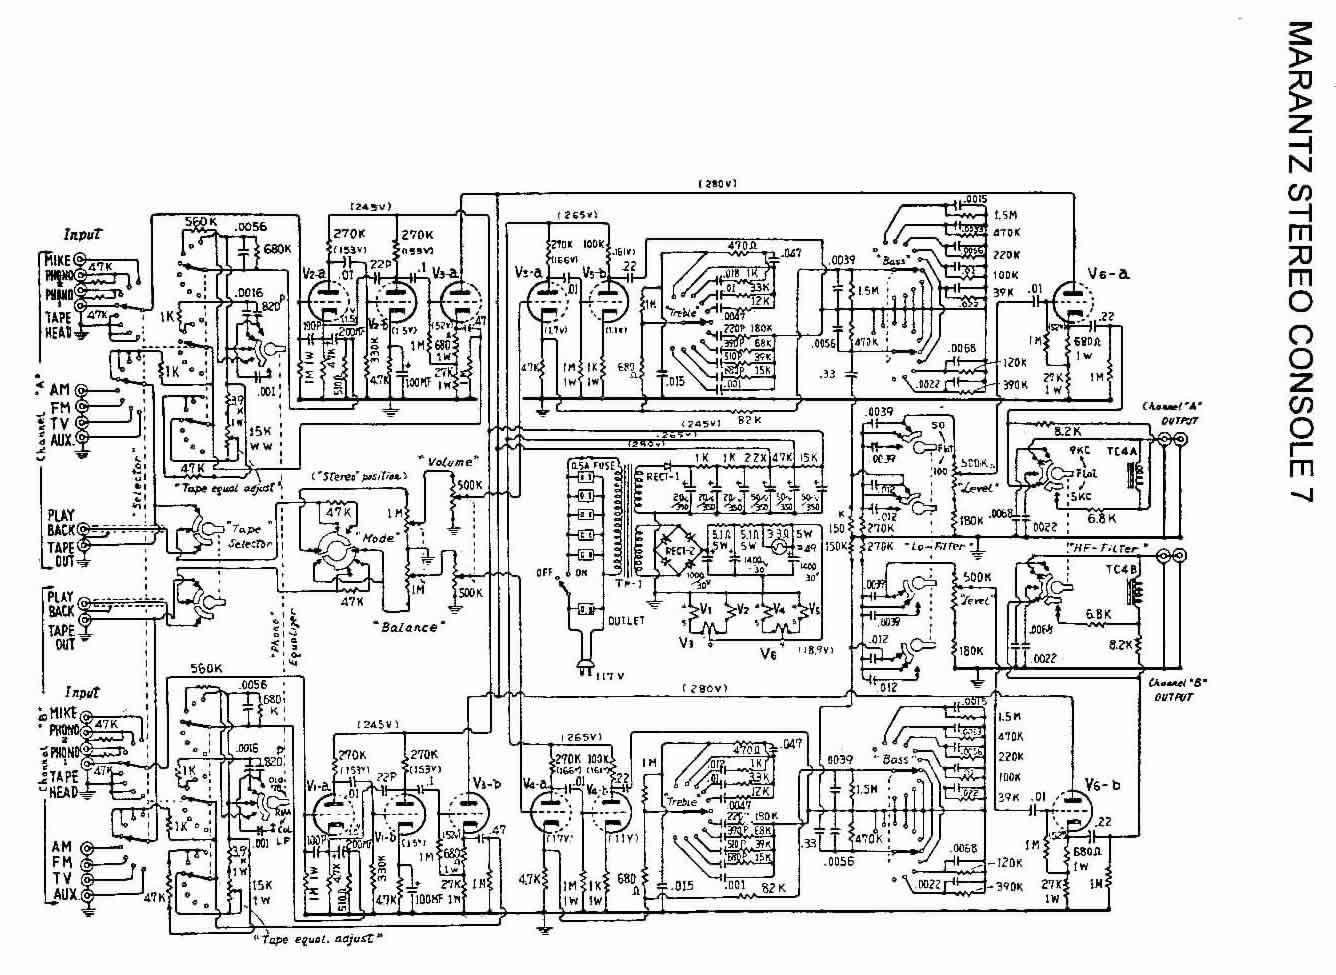 Marantz Console 7 Vacuum Tube Power Amplifier